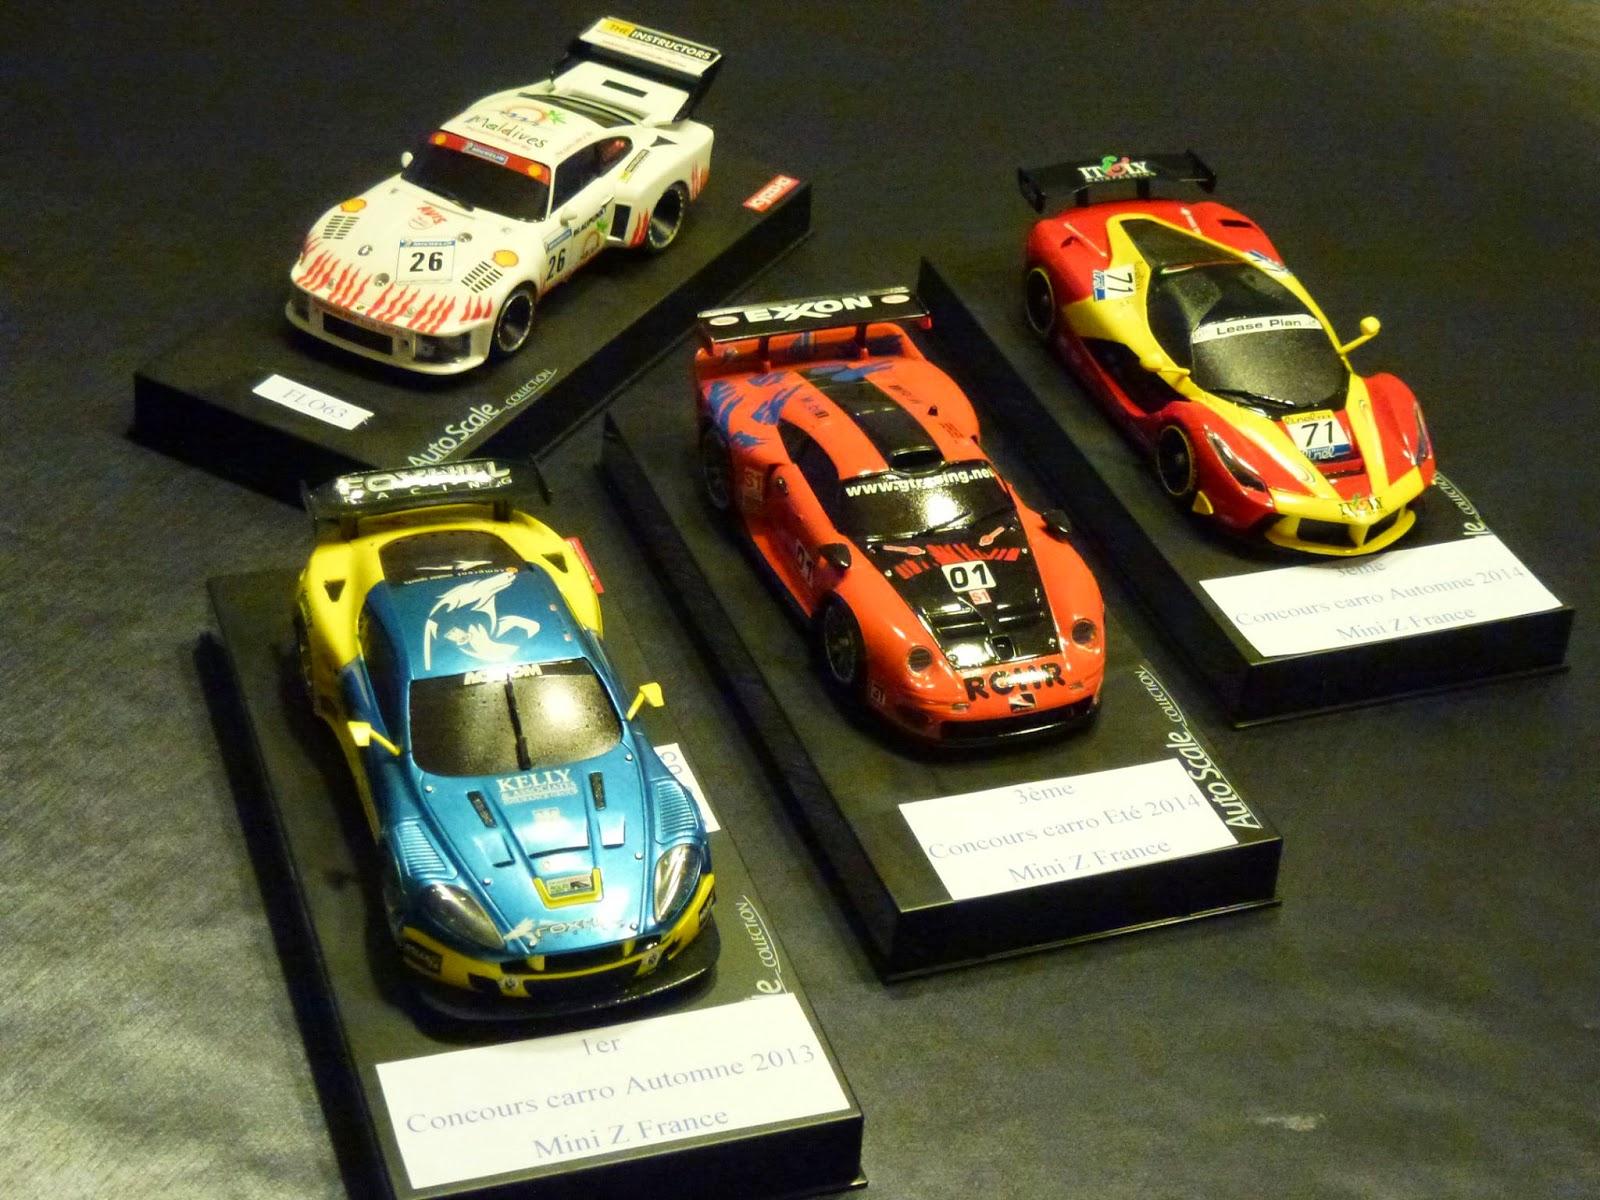 Kyoshosan 2014 Pn Racing V2 Rc Printed Circuit Board Assembly Mr03 Setting 4 Custom Mini Zs From France